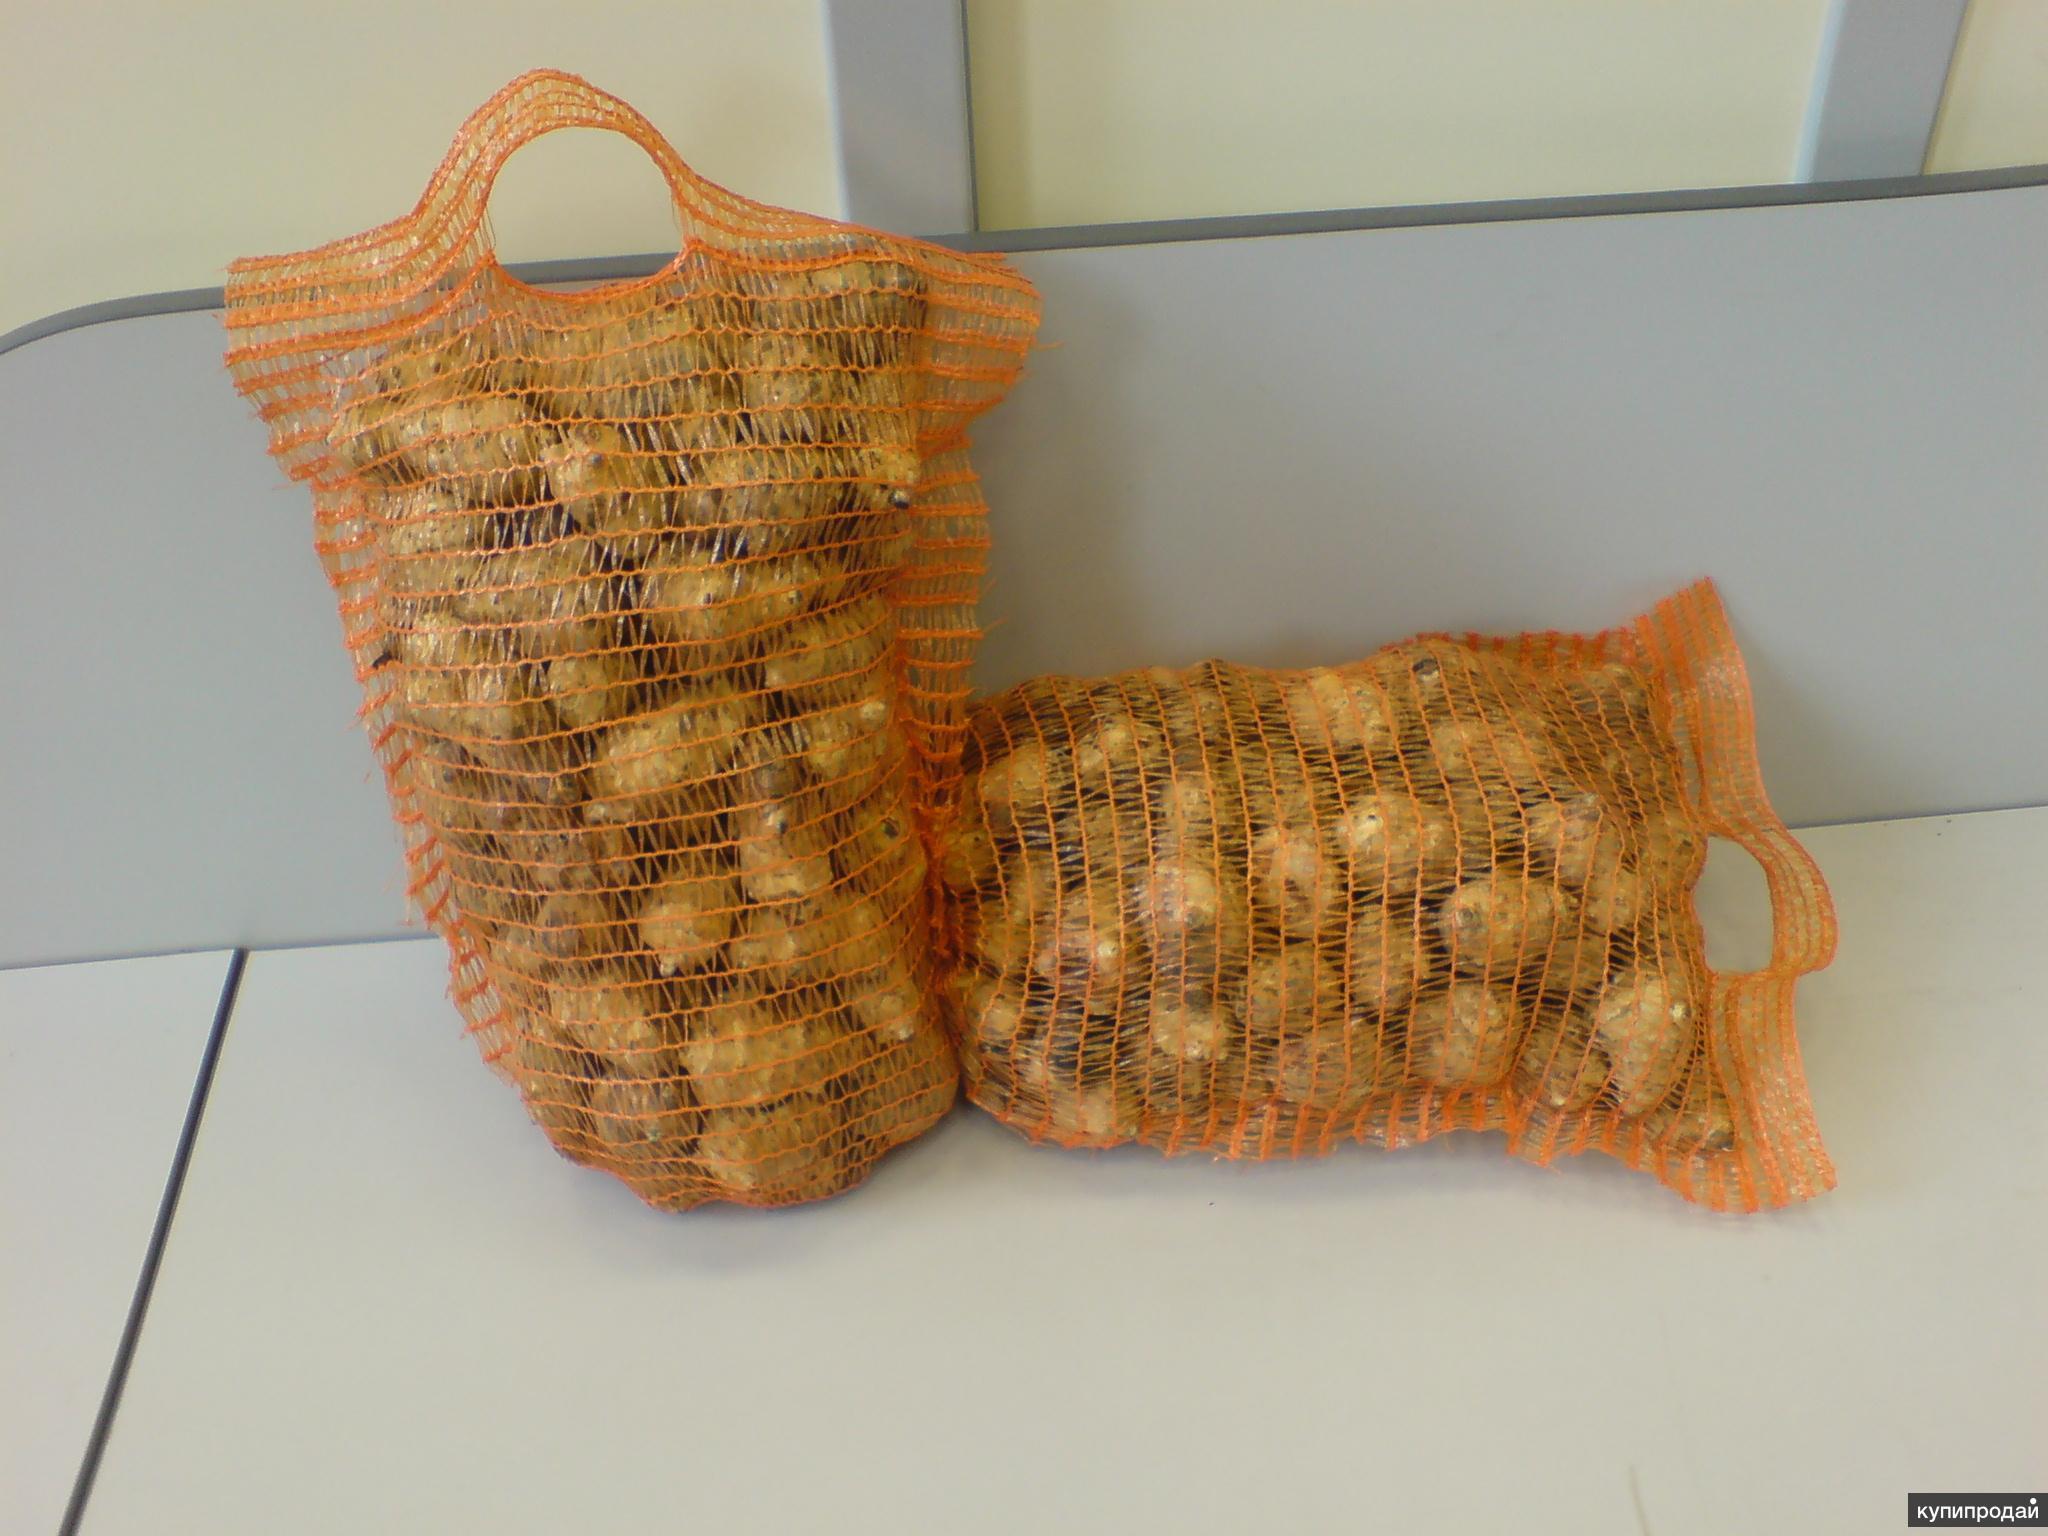 Клубни топинамбура (земляная груша)